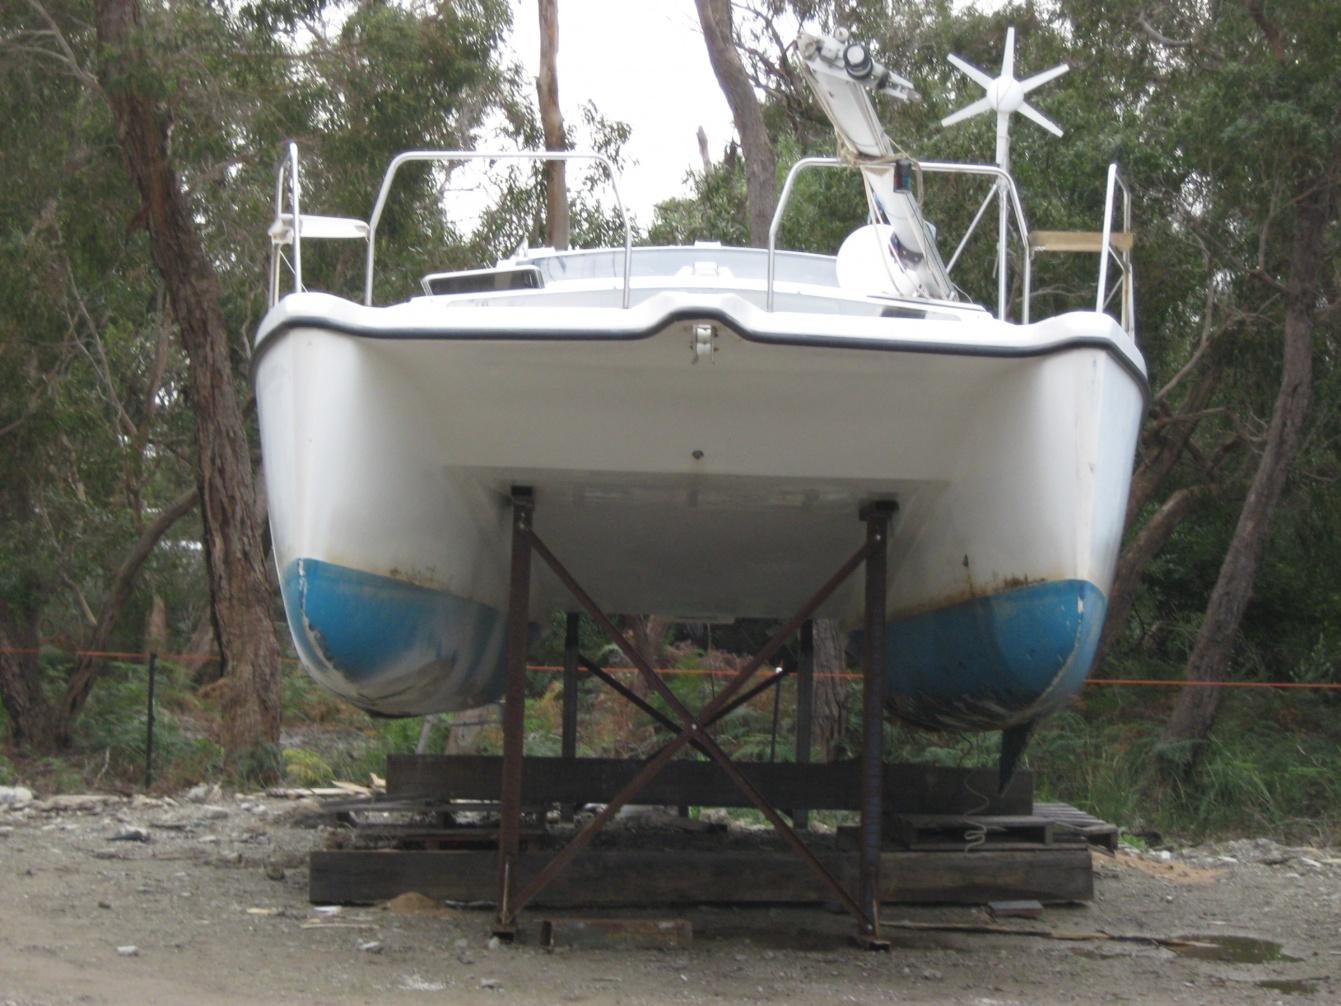 Click image for larger version  Name:Boat repairs in progress at Yaringa. June 2012 007.jpg Views:74 Size:424.3 KB ID:64803